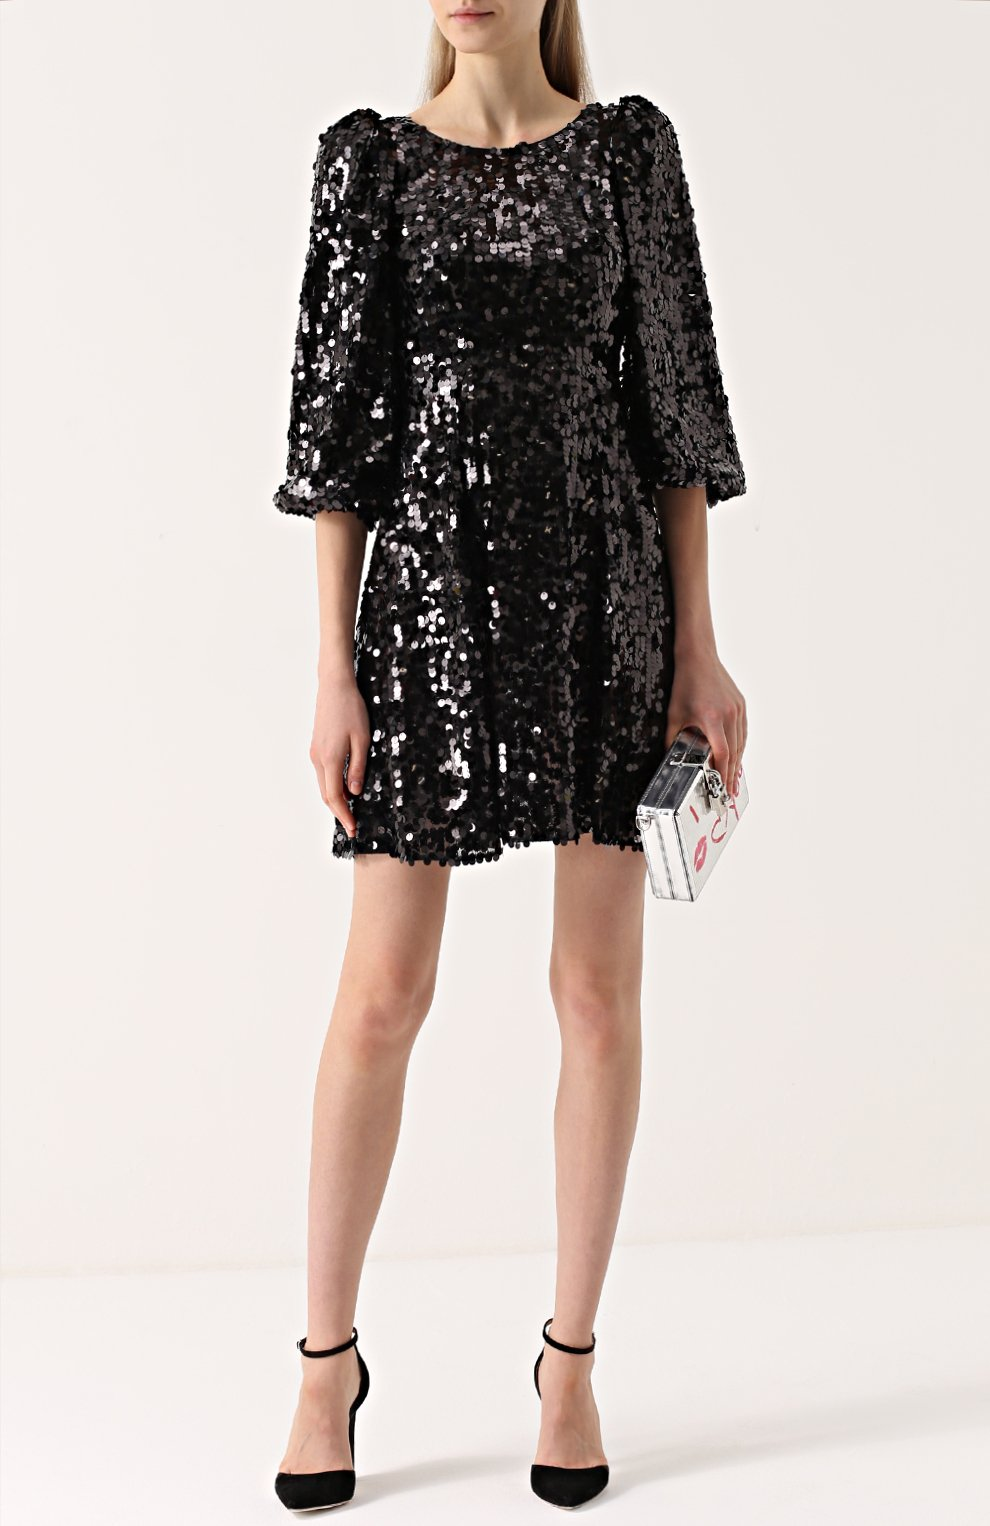 Мини-платье с пайетками и рукавом-фонарик | Фото №2